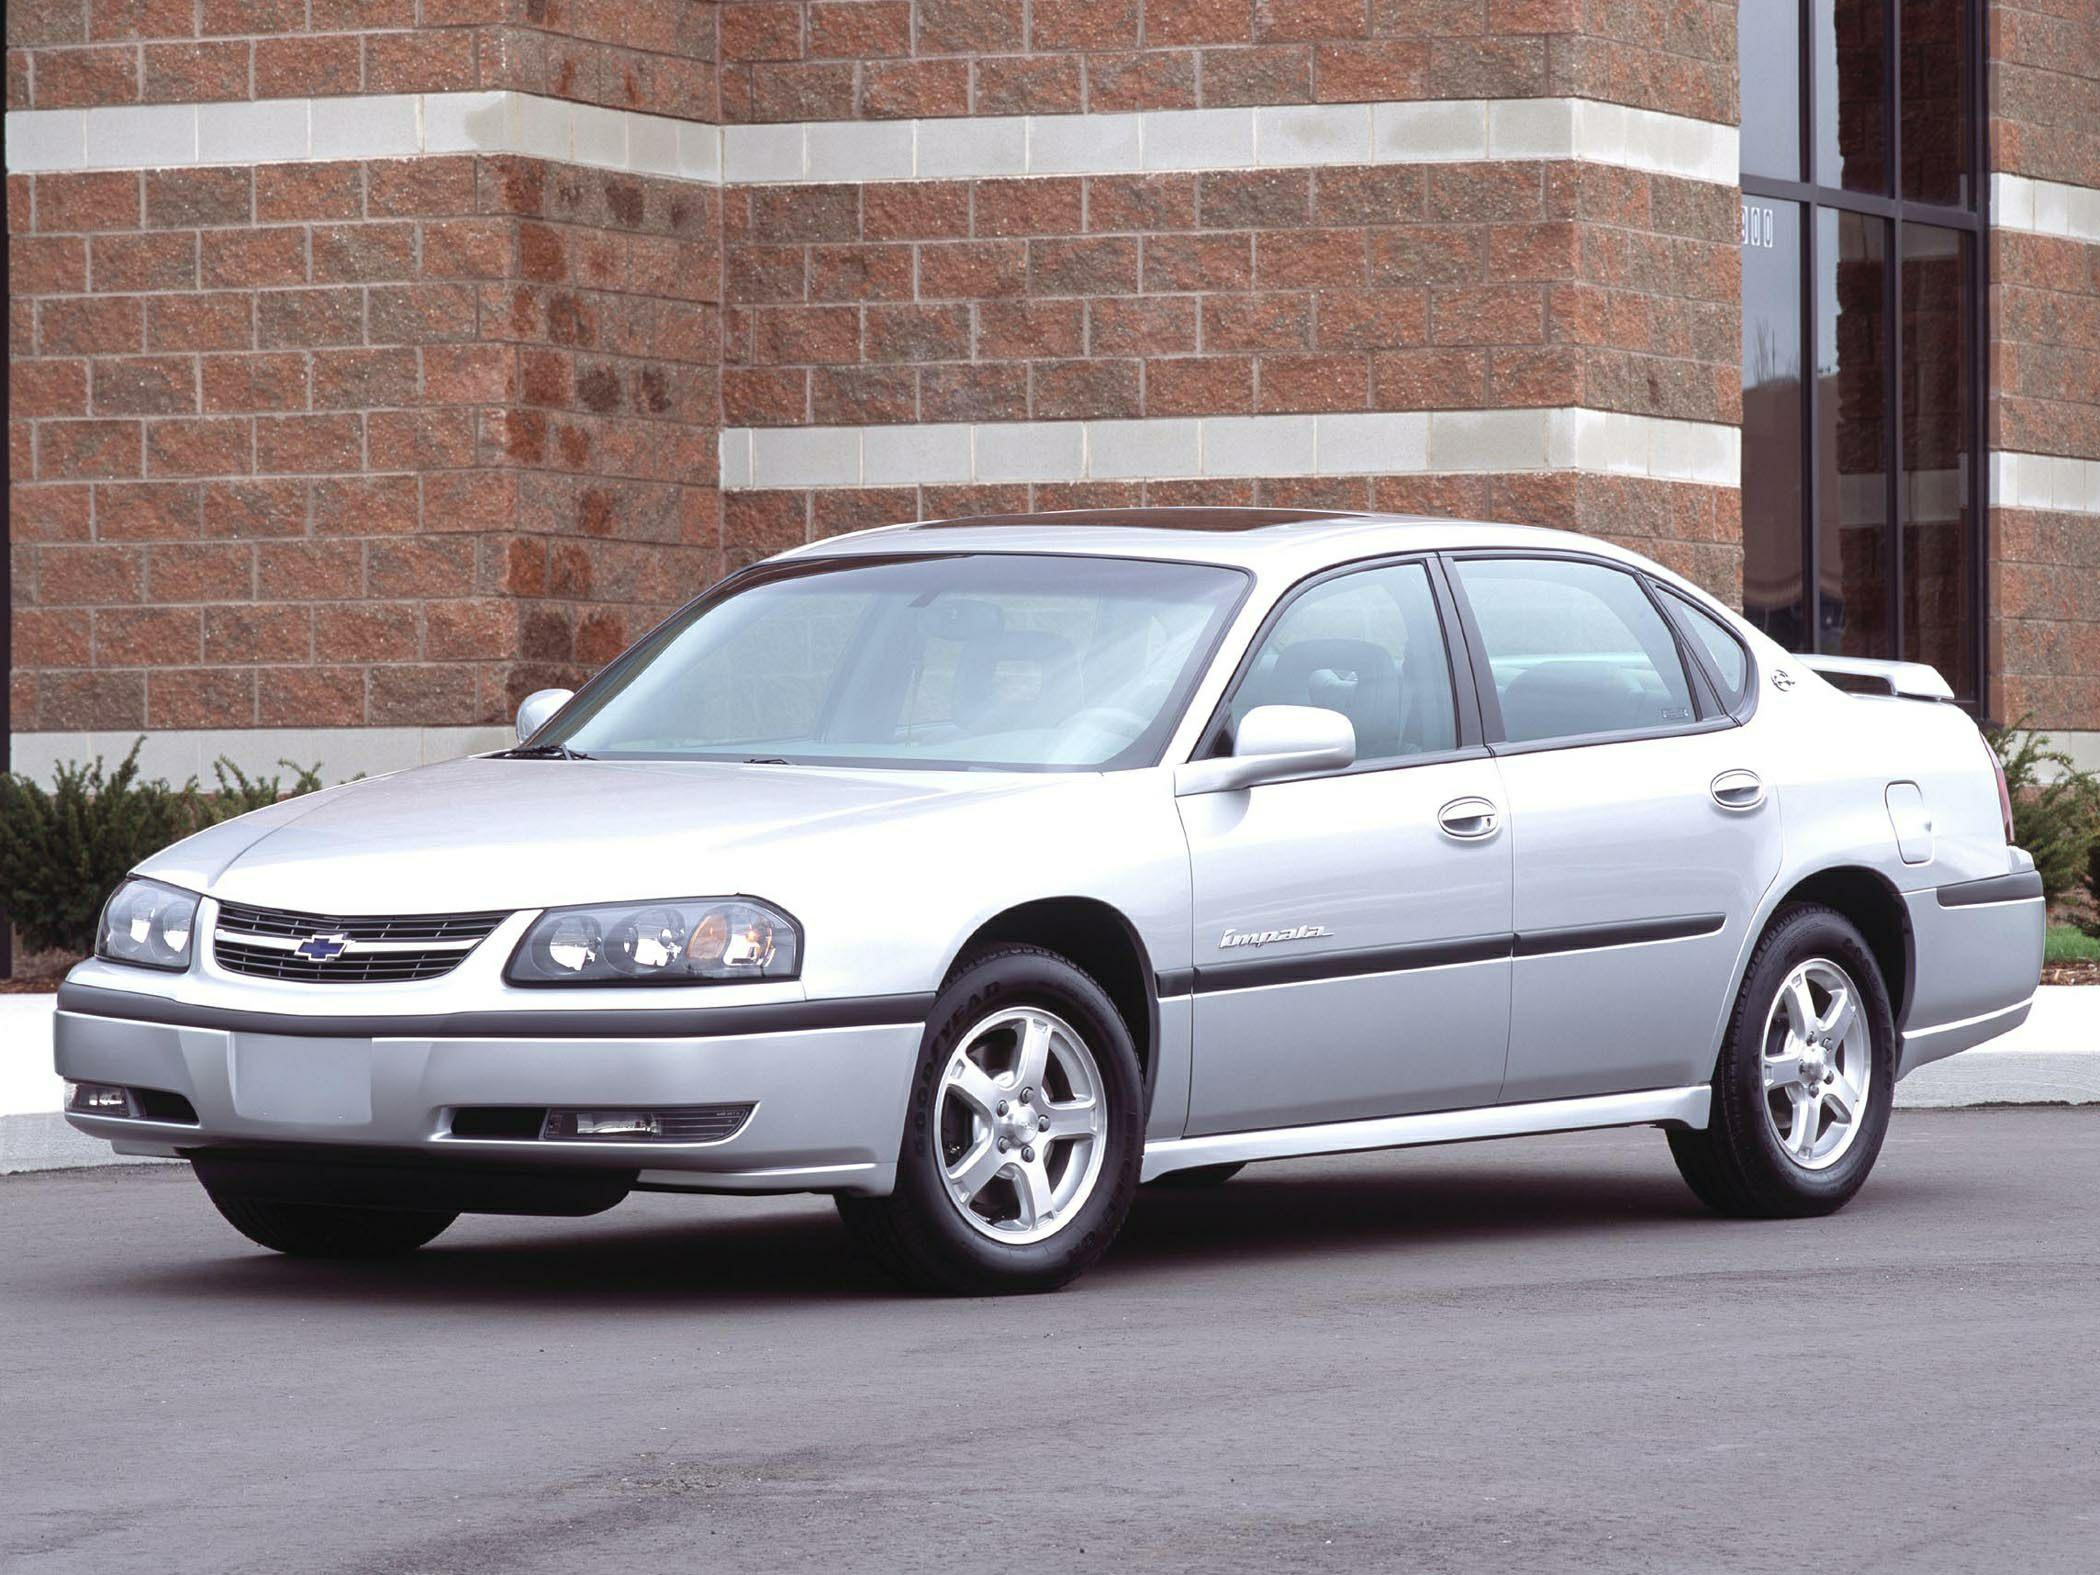 2010 Chevy Impala For Sale >> 2003 Chevrolet Impala Reviews, Specs and Prices   Cars.com